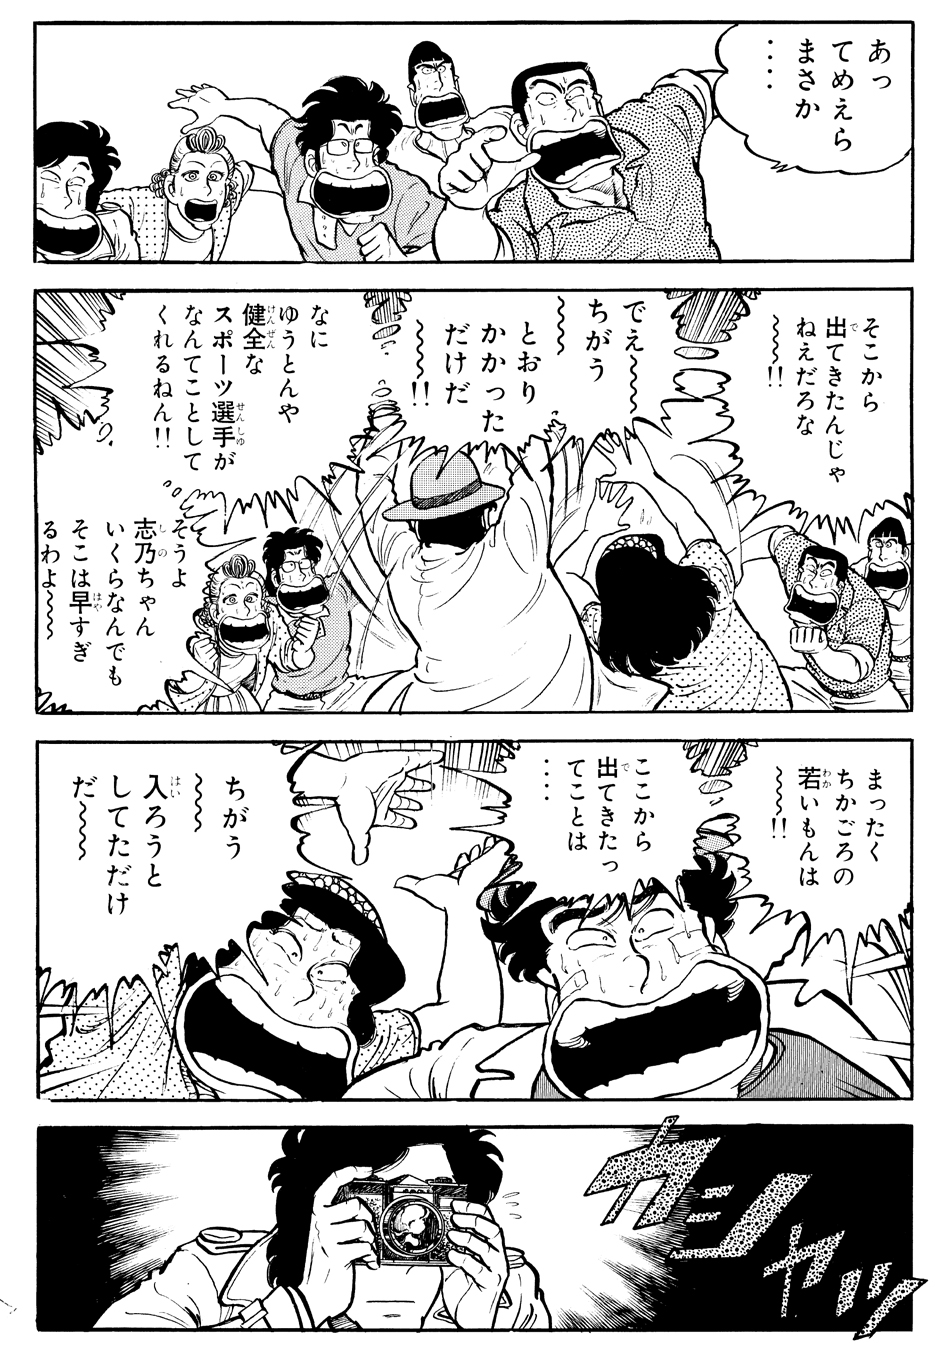 sanshiro_22